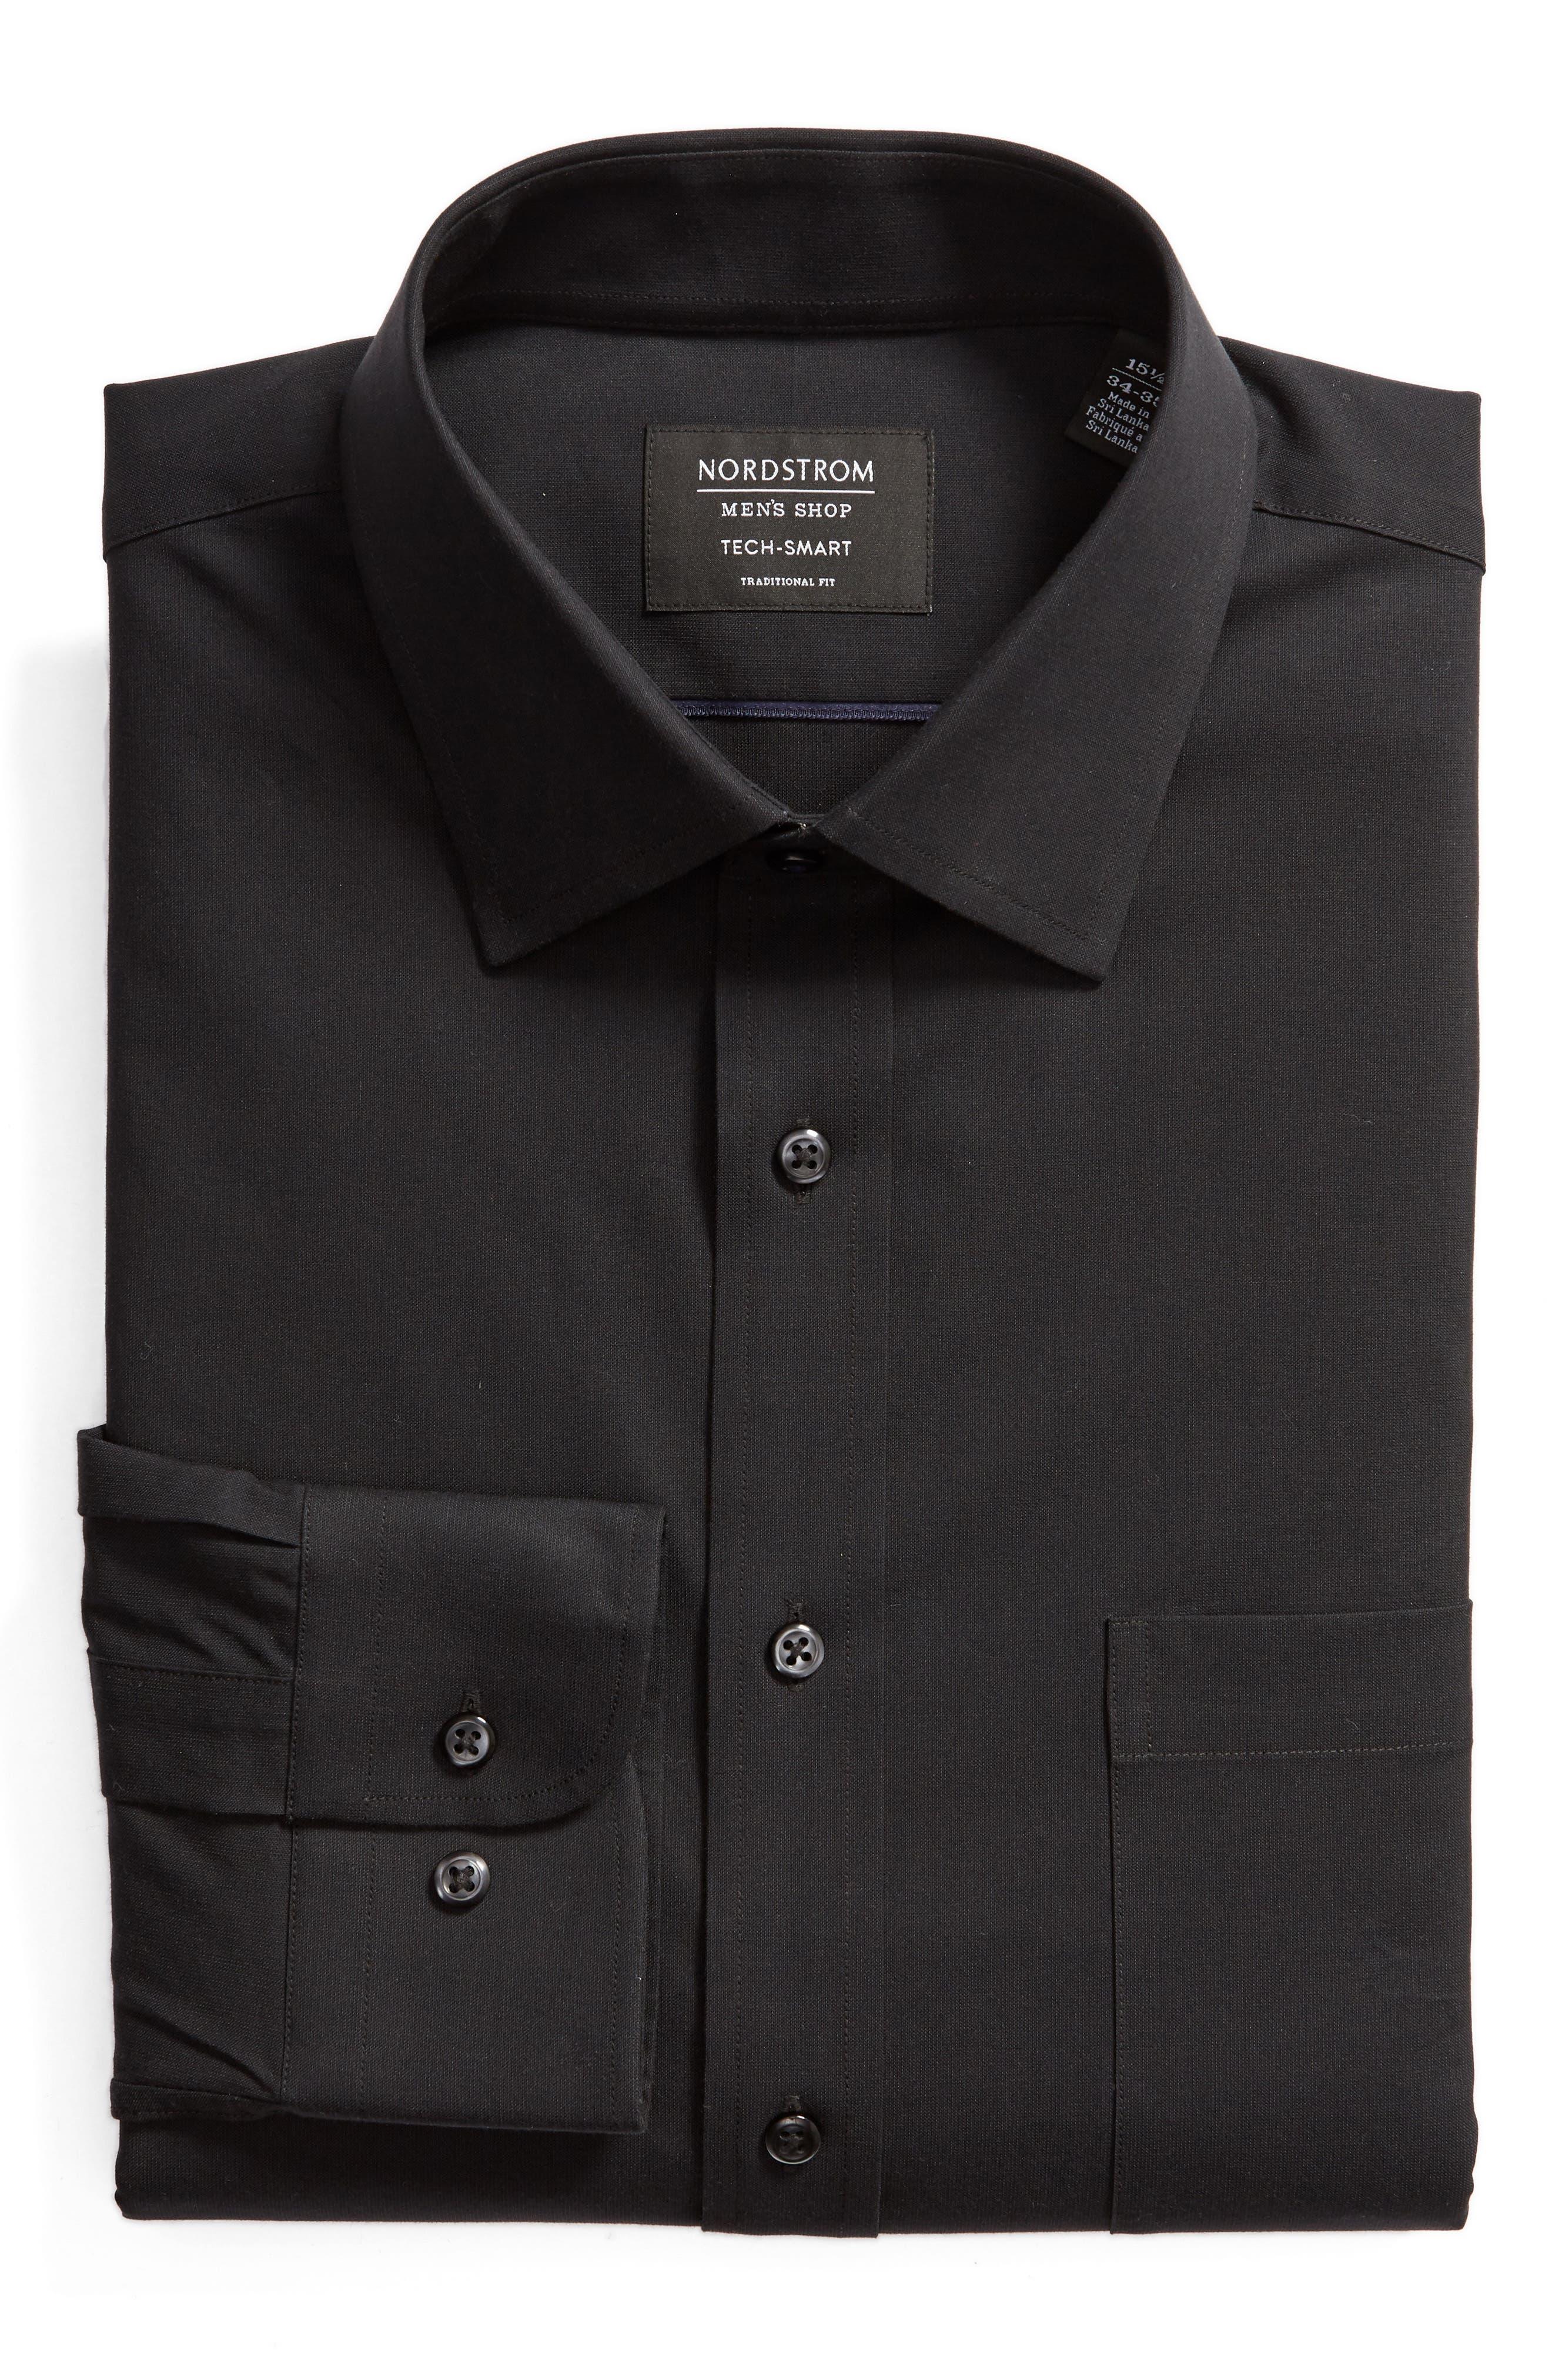 NORDSTROM MEN'S SHOP, Tech-Smart Traditional Fit Stretch Pinpoint Dress Shirt, Alternate thumbnail 5, color, BLACK ROCK